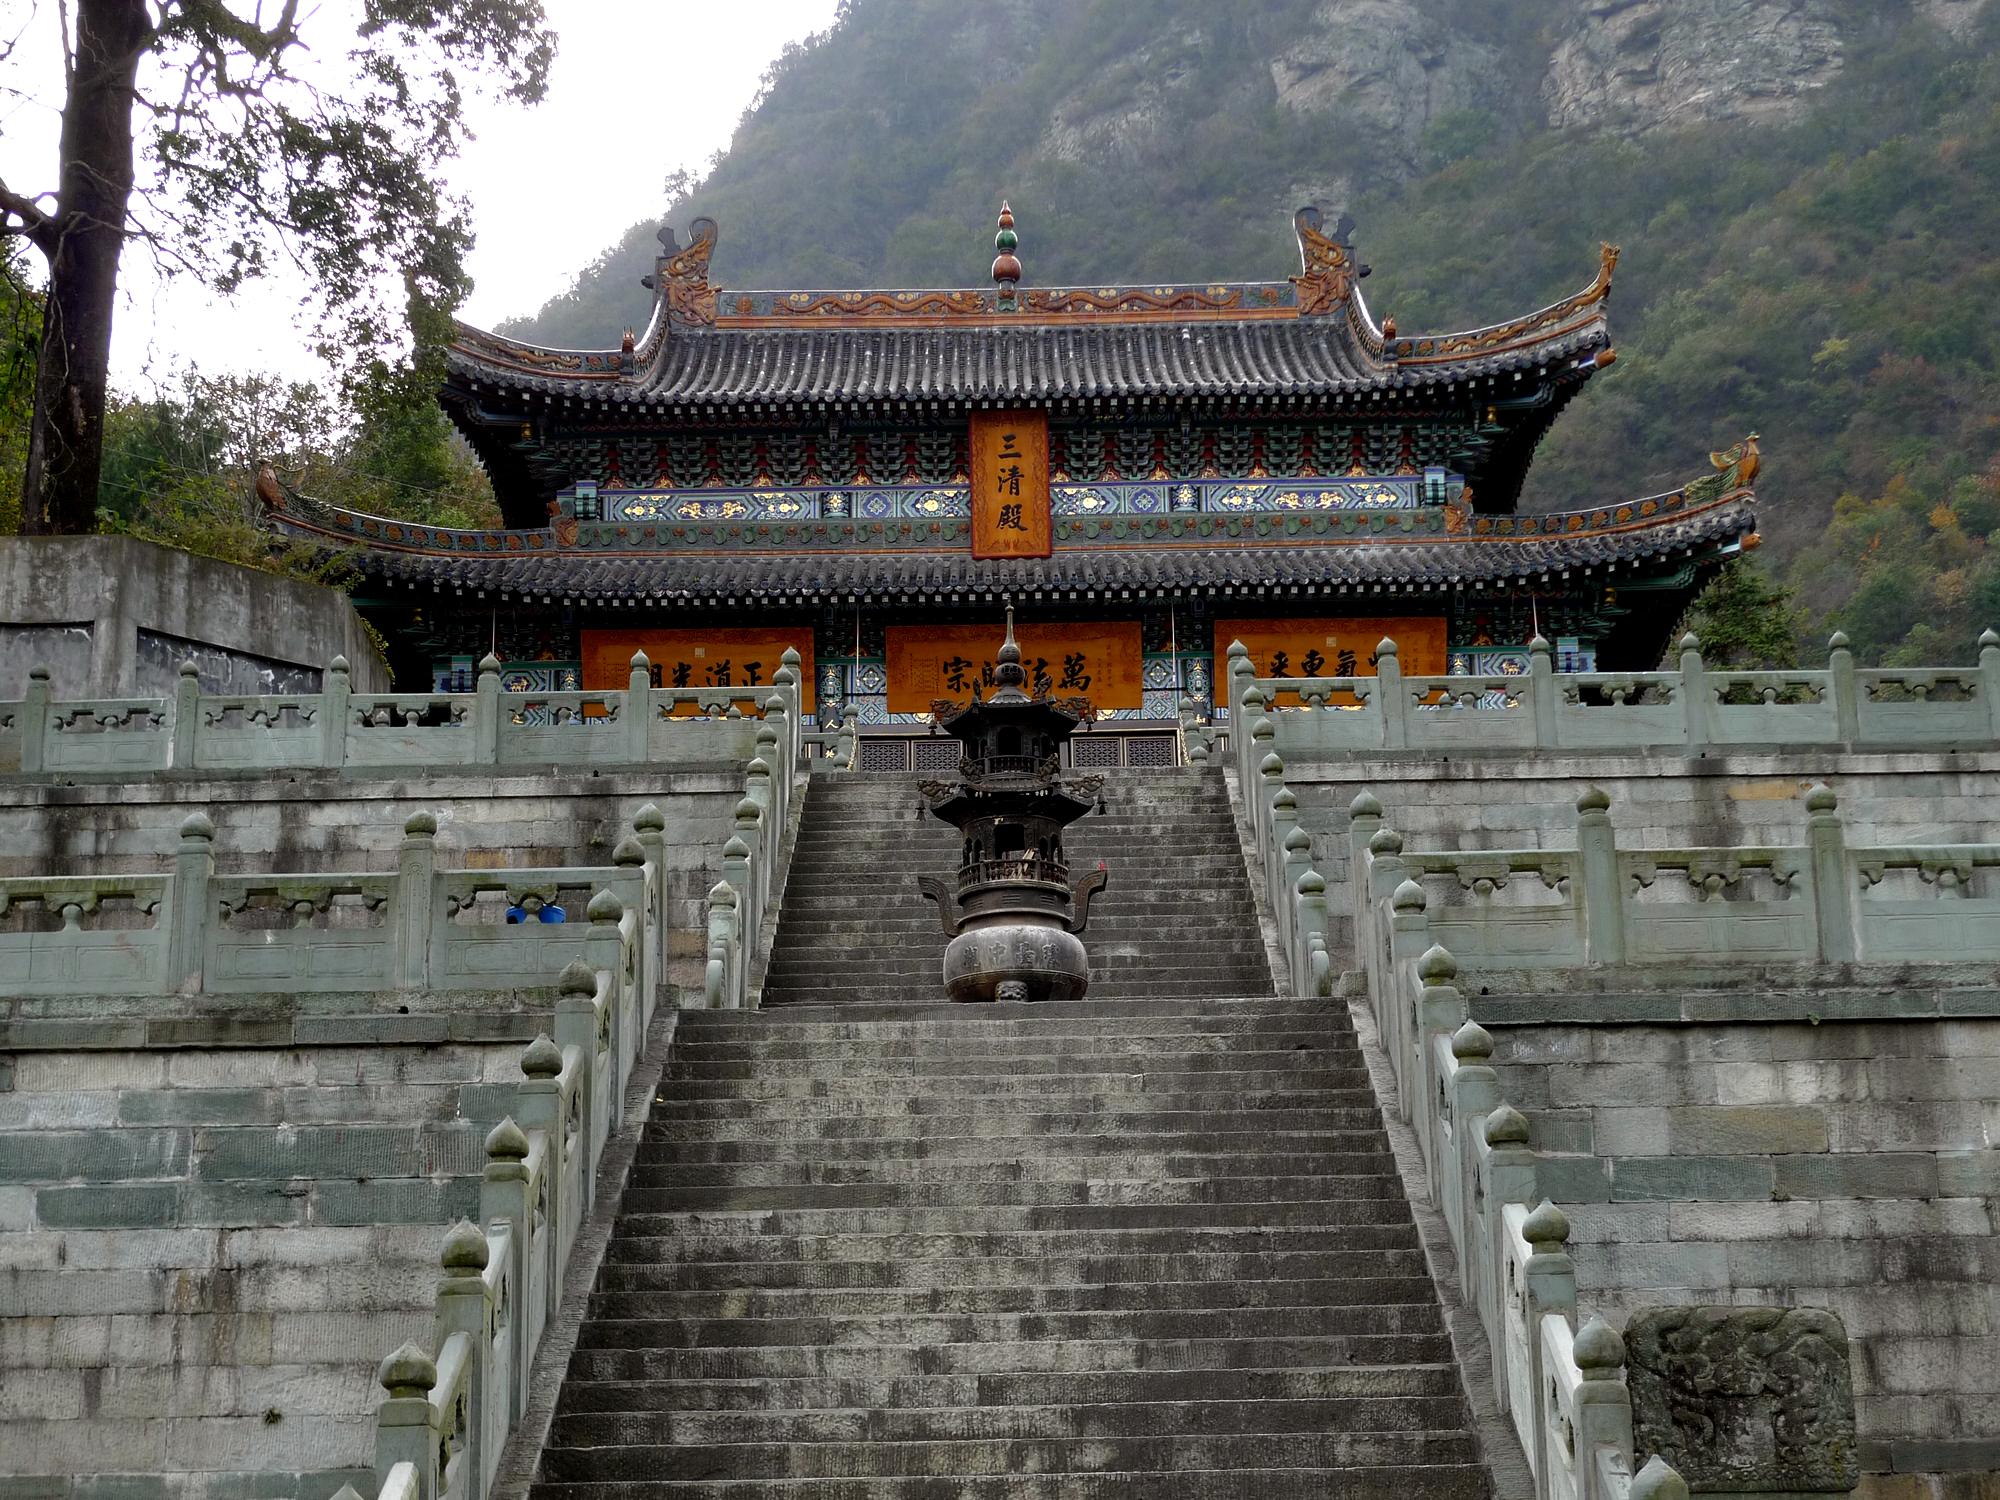 File:武当山三清殿.JPG - Wikimedia Commons